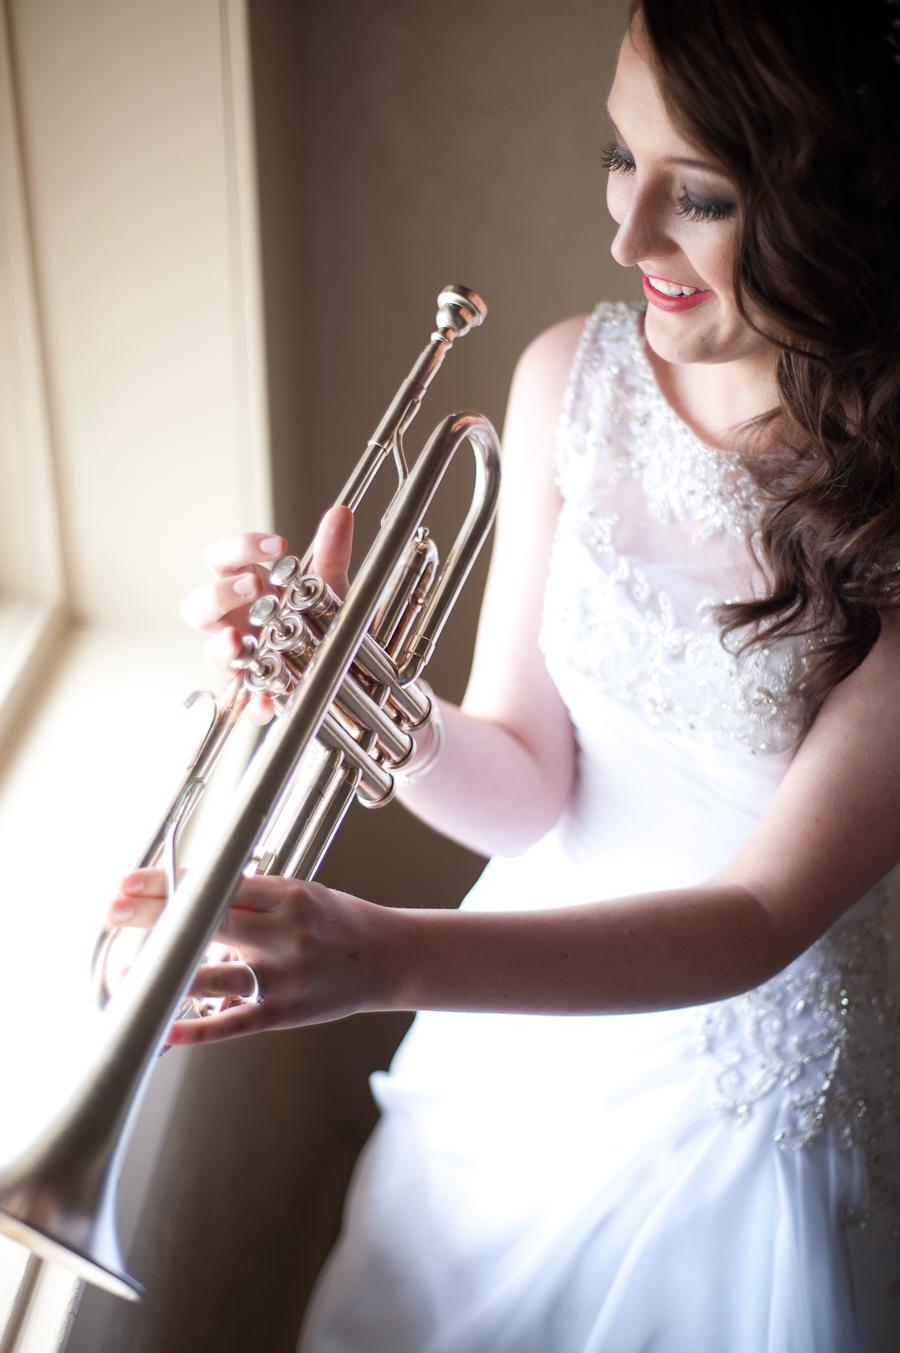 Susannah_Deangelo_Antique_Silver_Music_Hall_Wedding-36.jpg